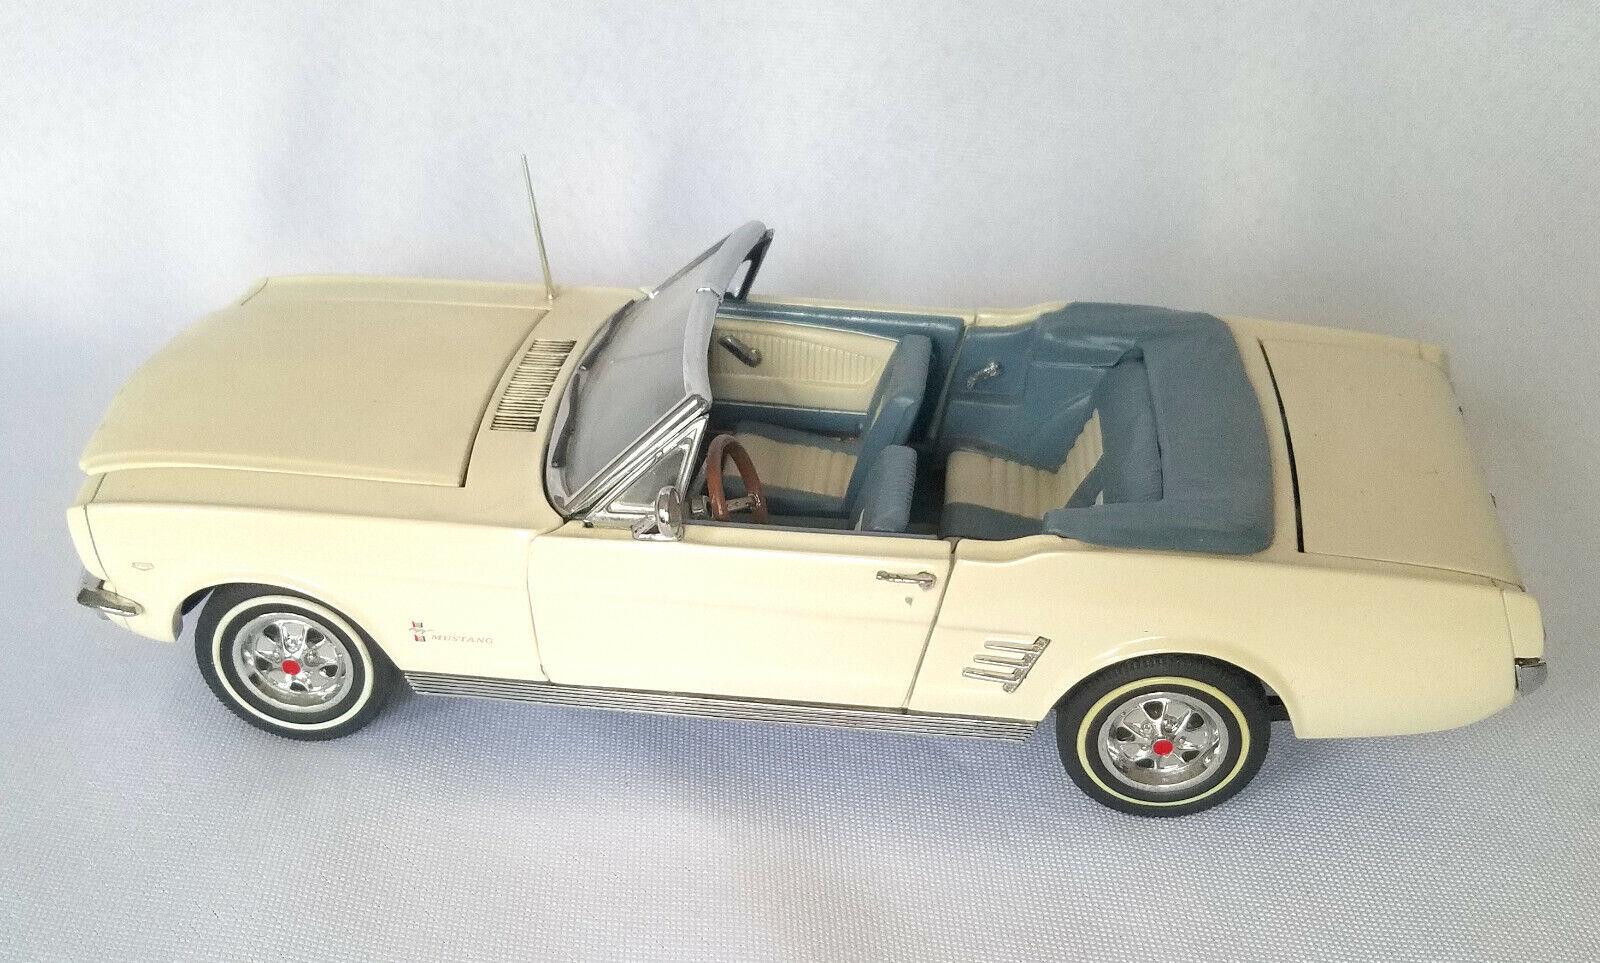 Danbury Mint 1966 Ford Mustang ConGrünible 1 24 Diecast 1 24 Weiß